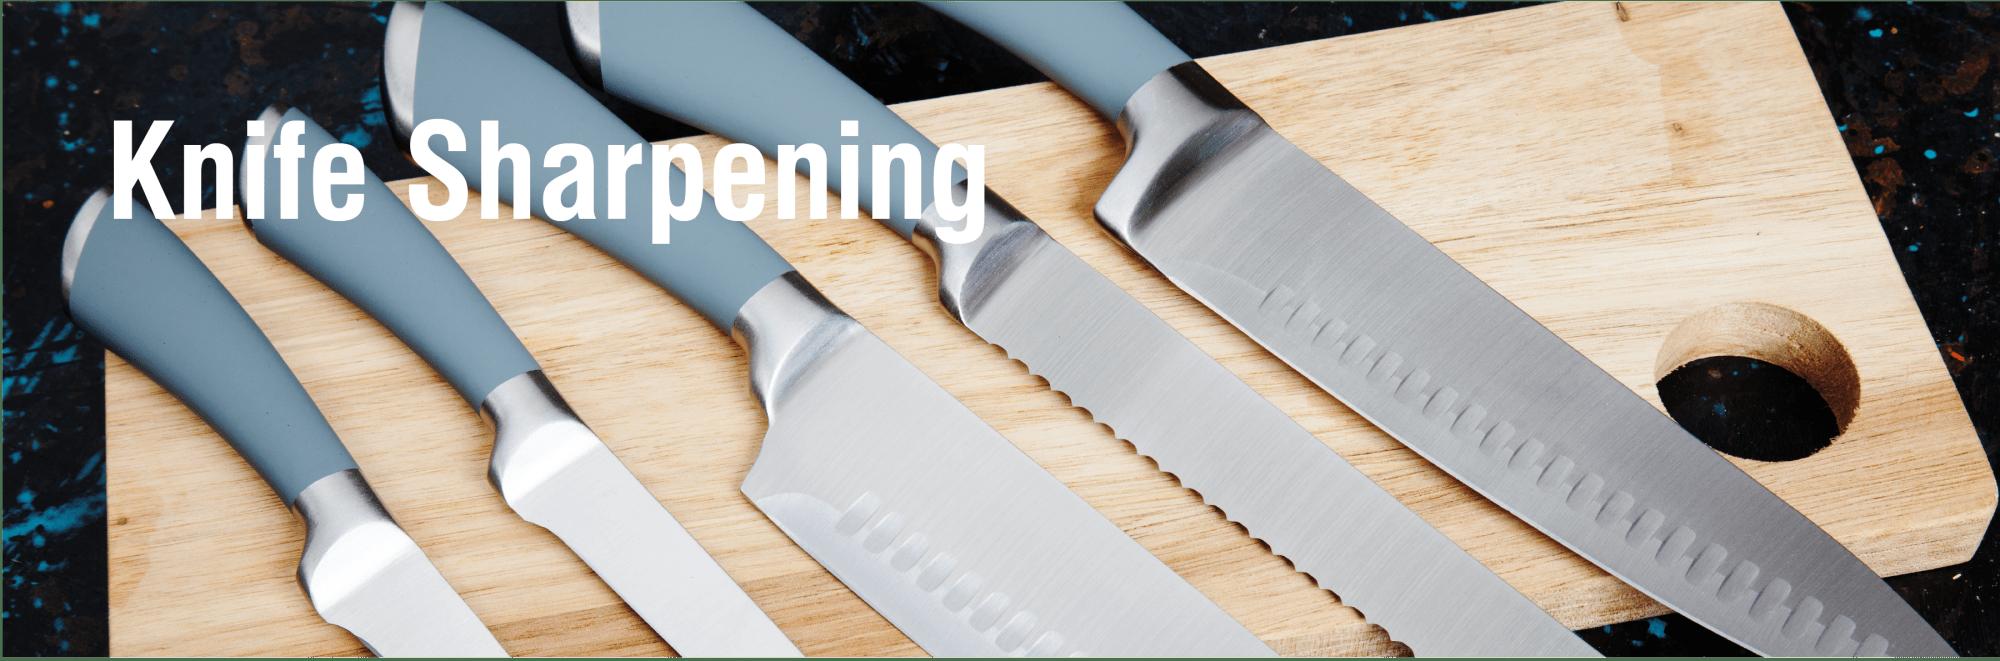 knife sharpening service, Bolton, Horwich, Chorley